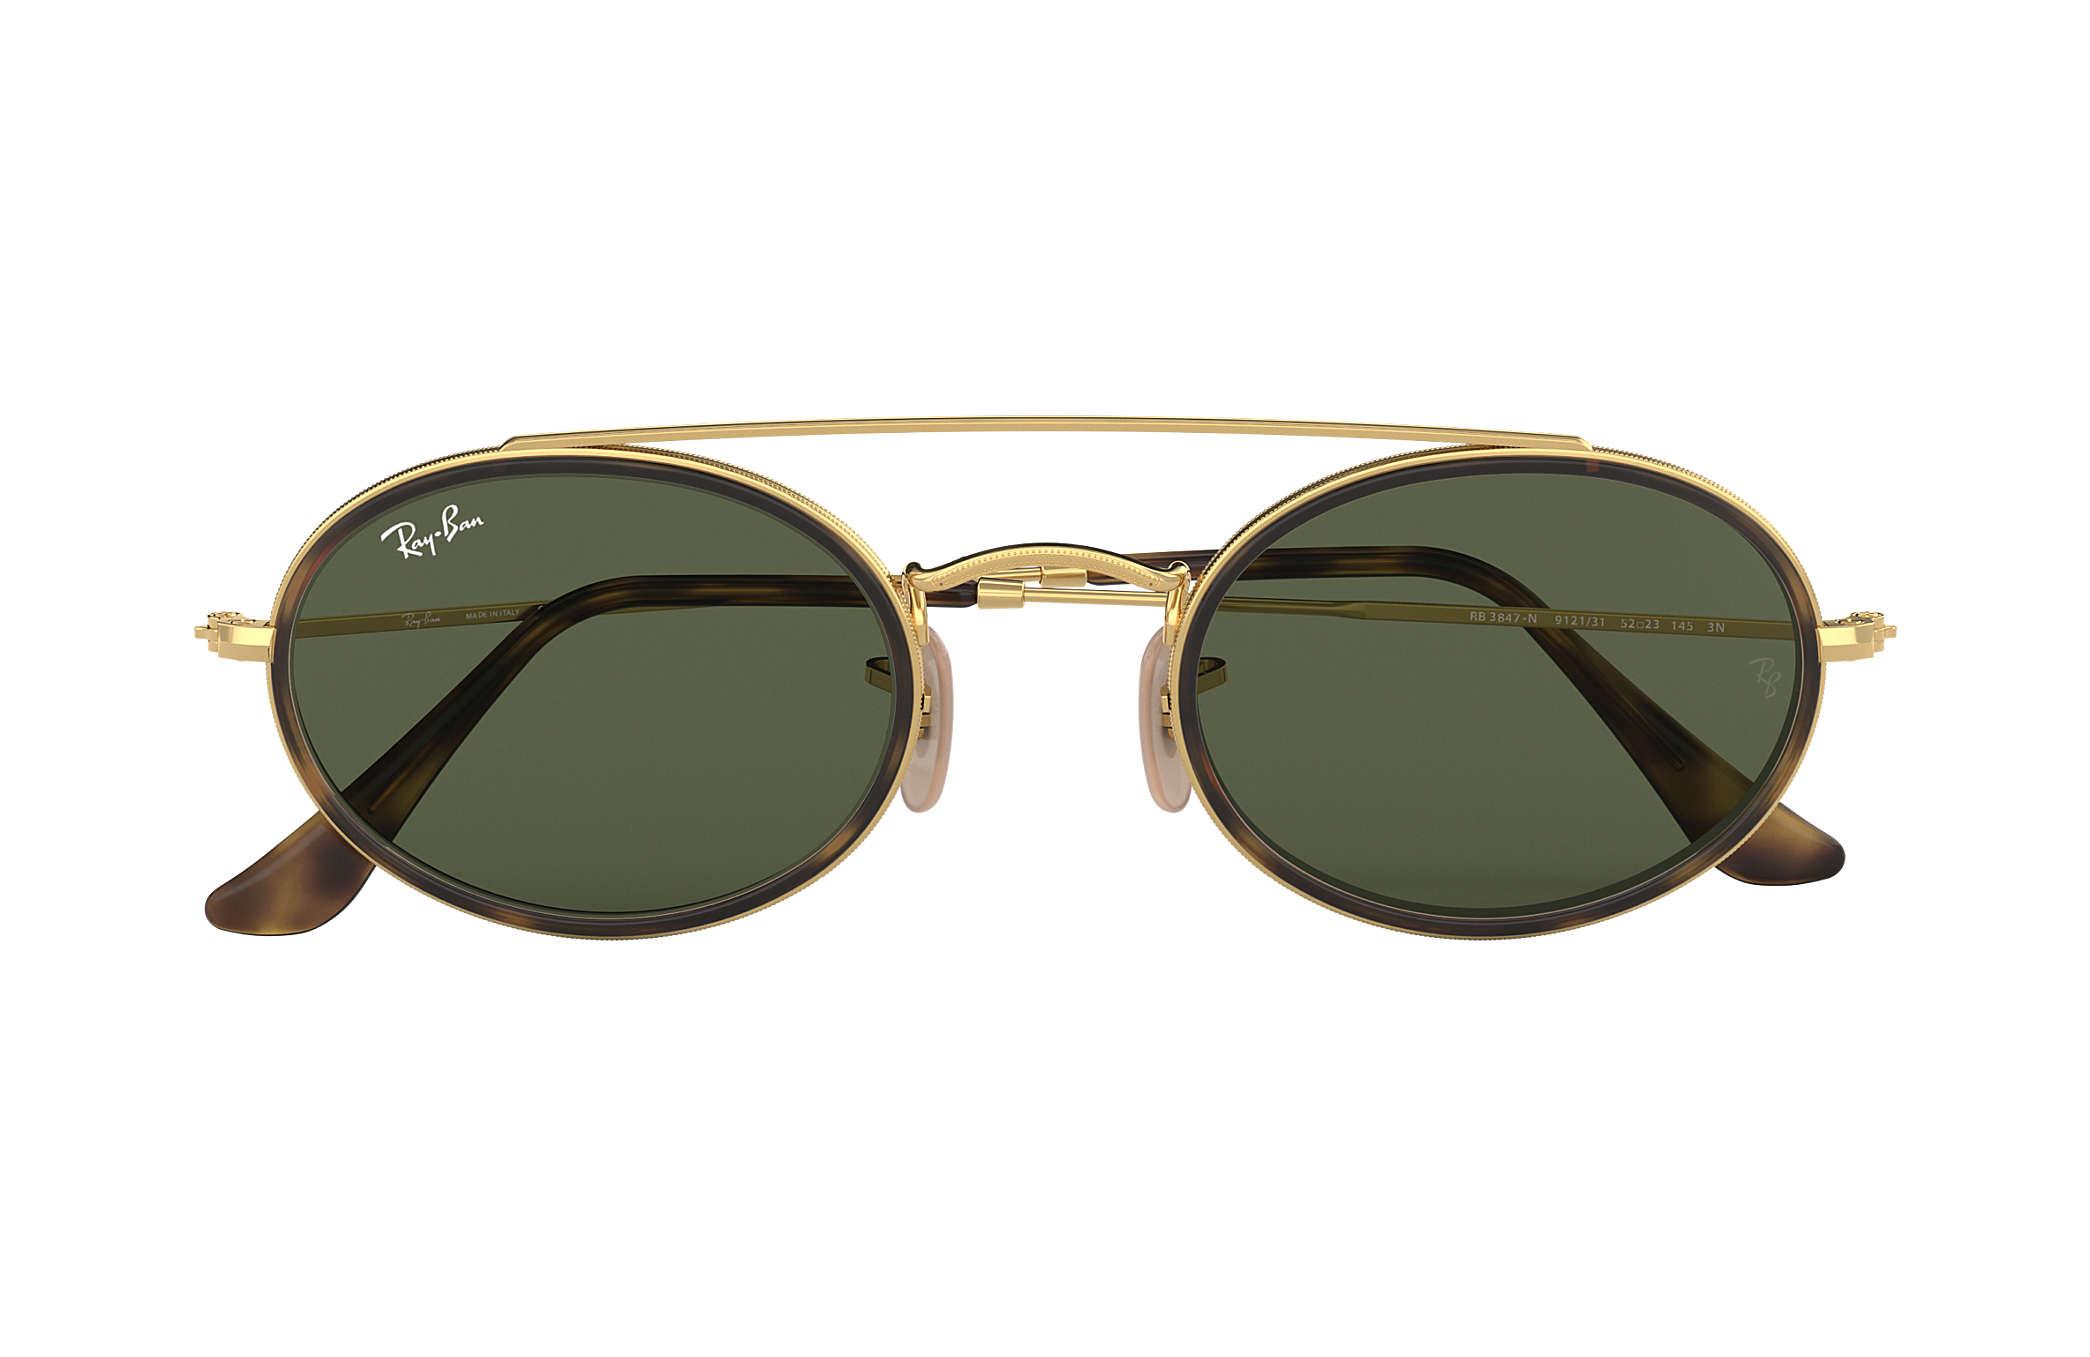 d667492abdc Ray-Ban Oval Double Bridge RB3847N Gold - Metal - Green Lenses ...